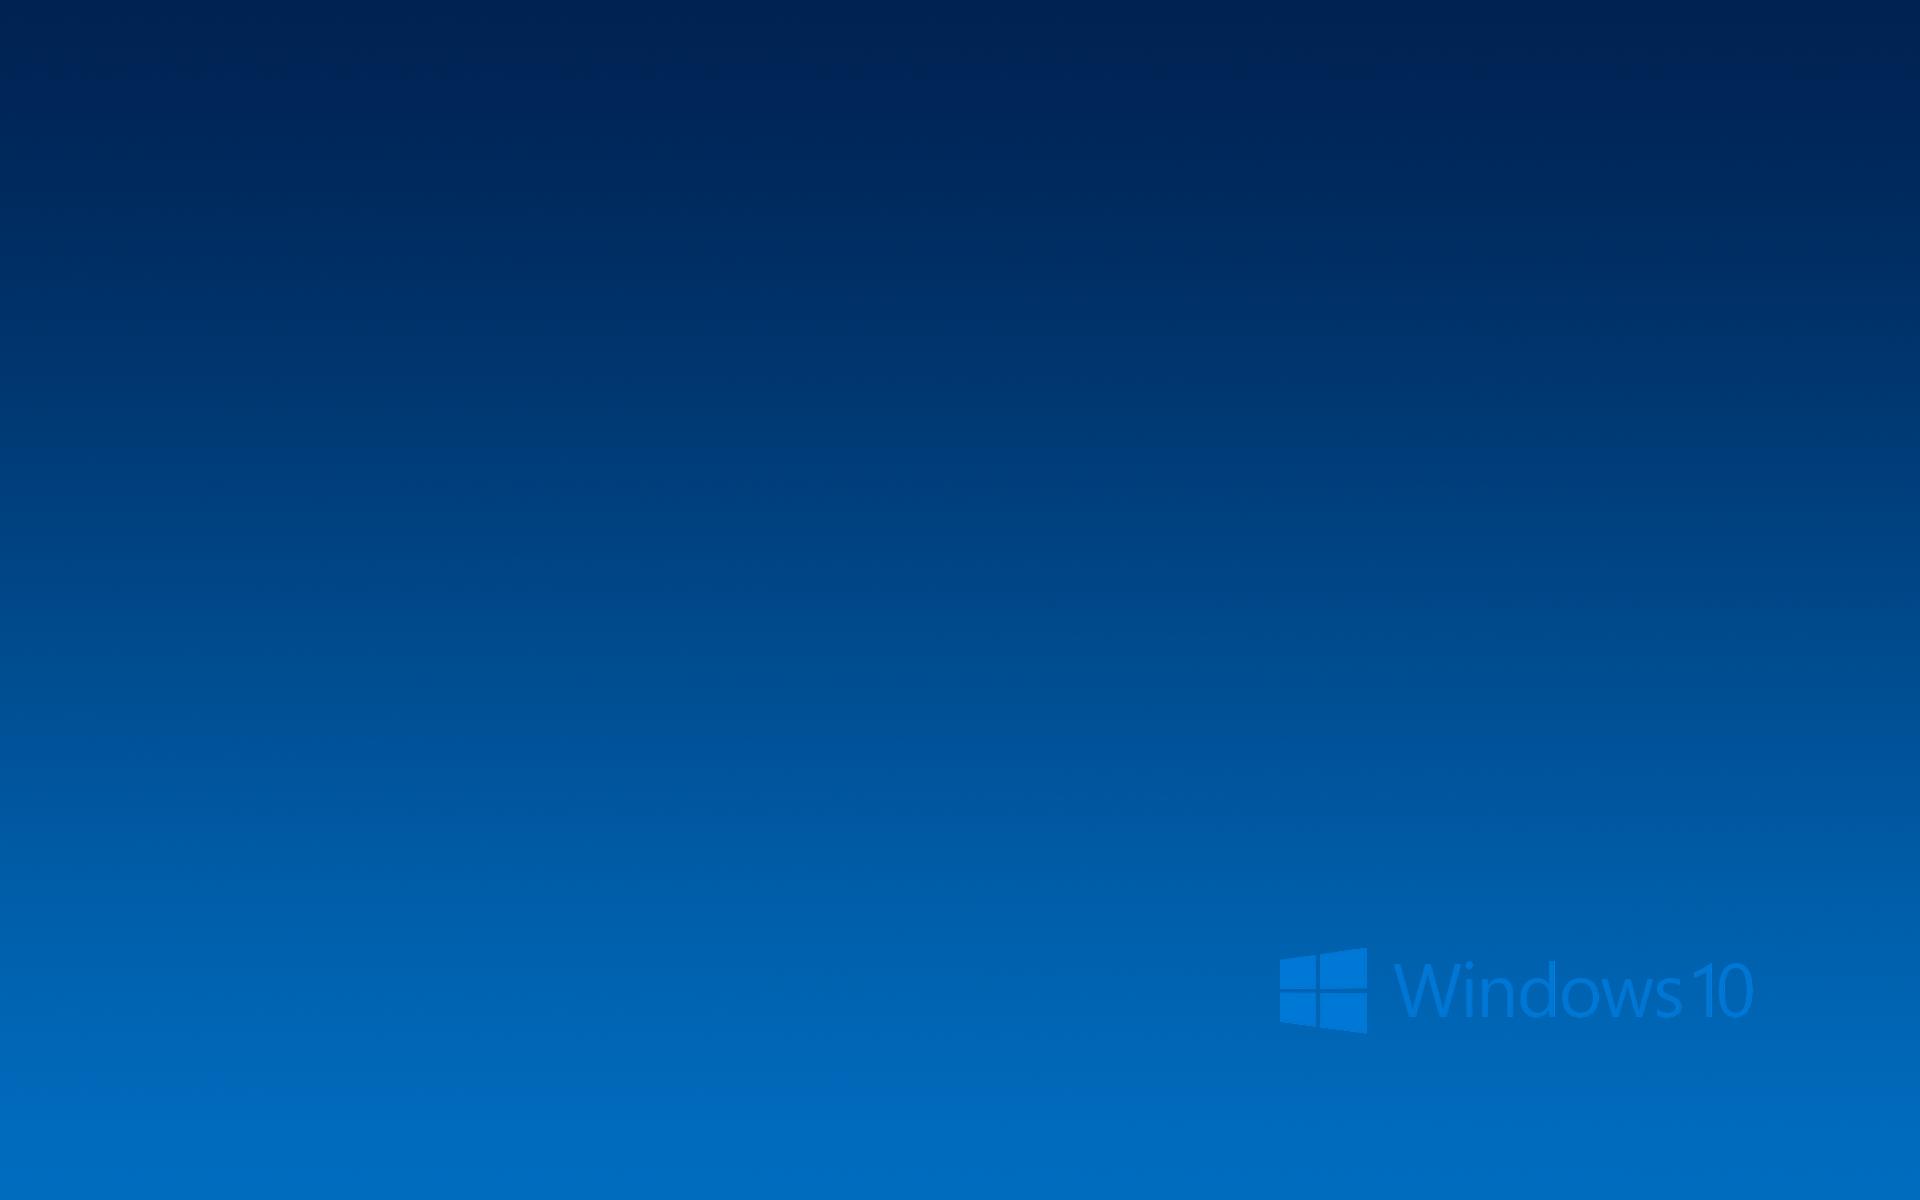 Fondo De Pantalla 1920x1200 Id: Windows 10 Fondo De Pantalla HD